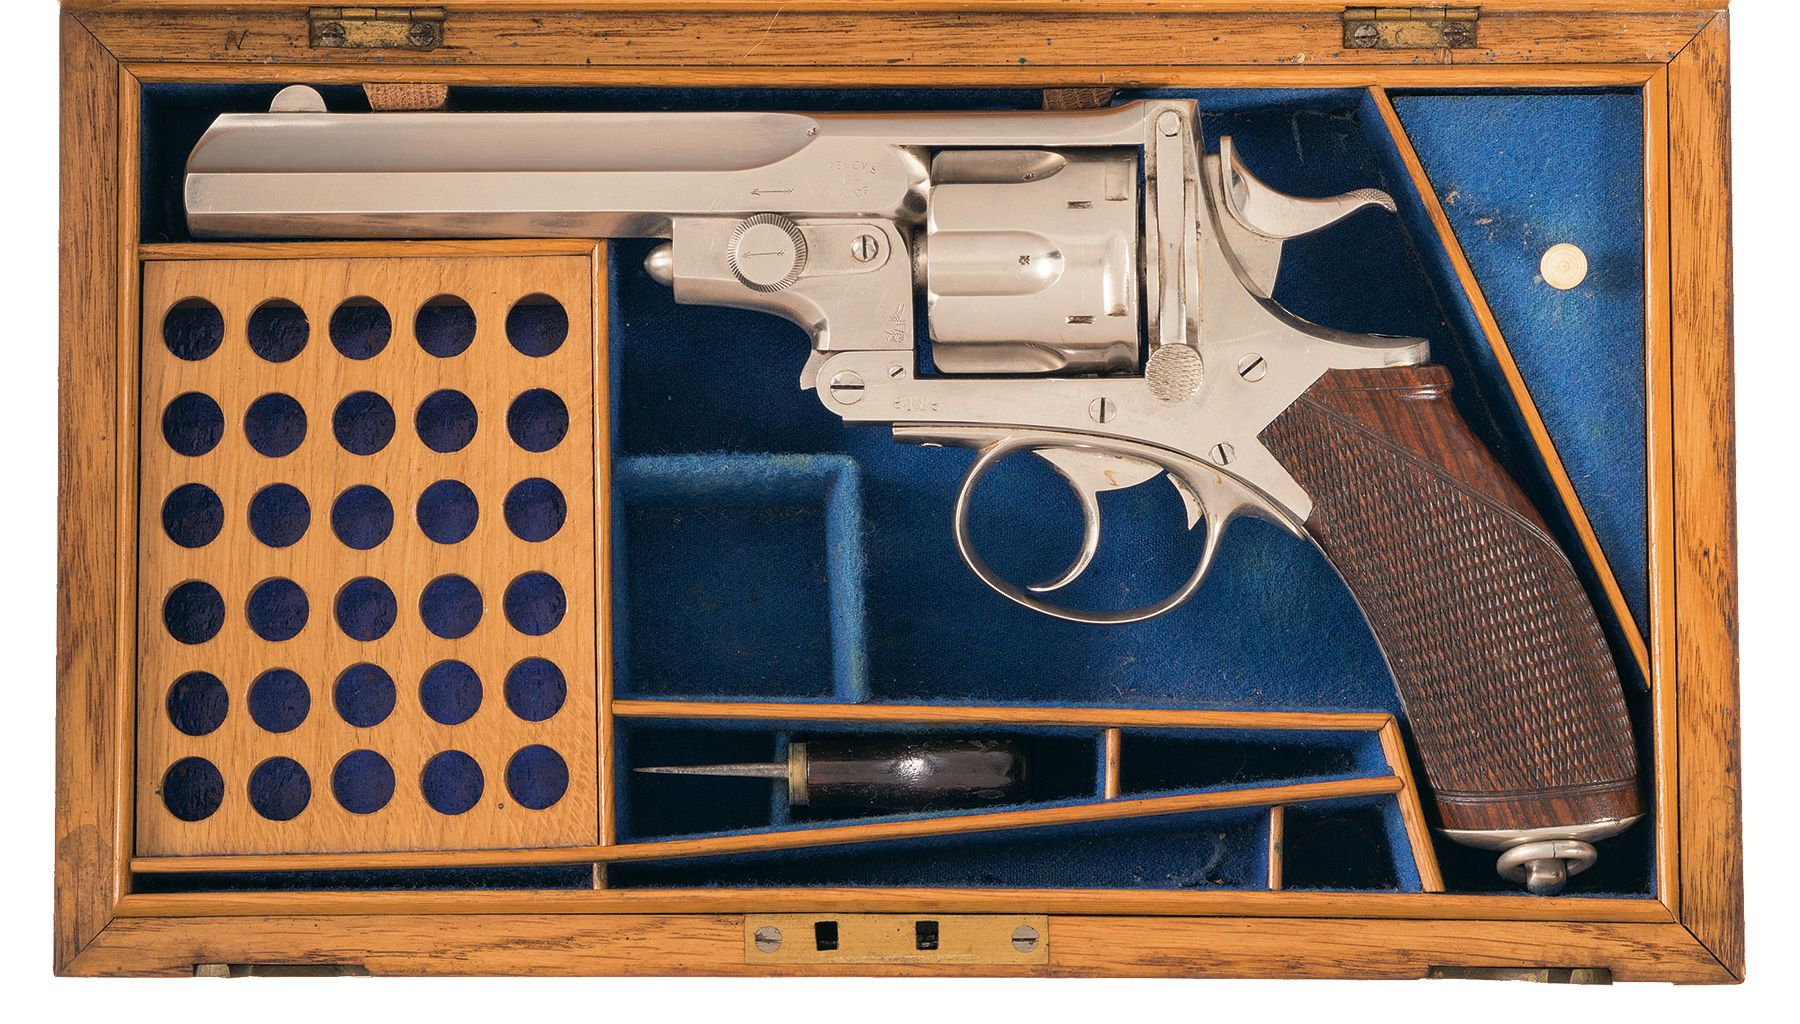 Webley-pryse Number 4 Revolver